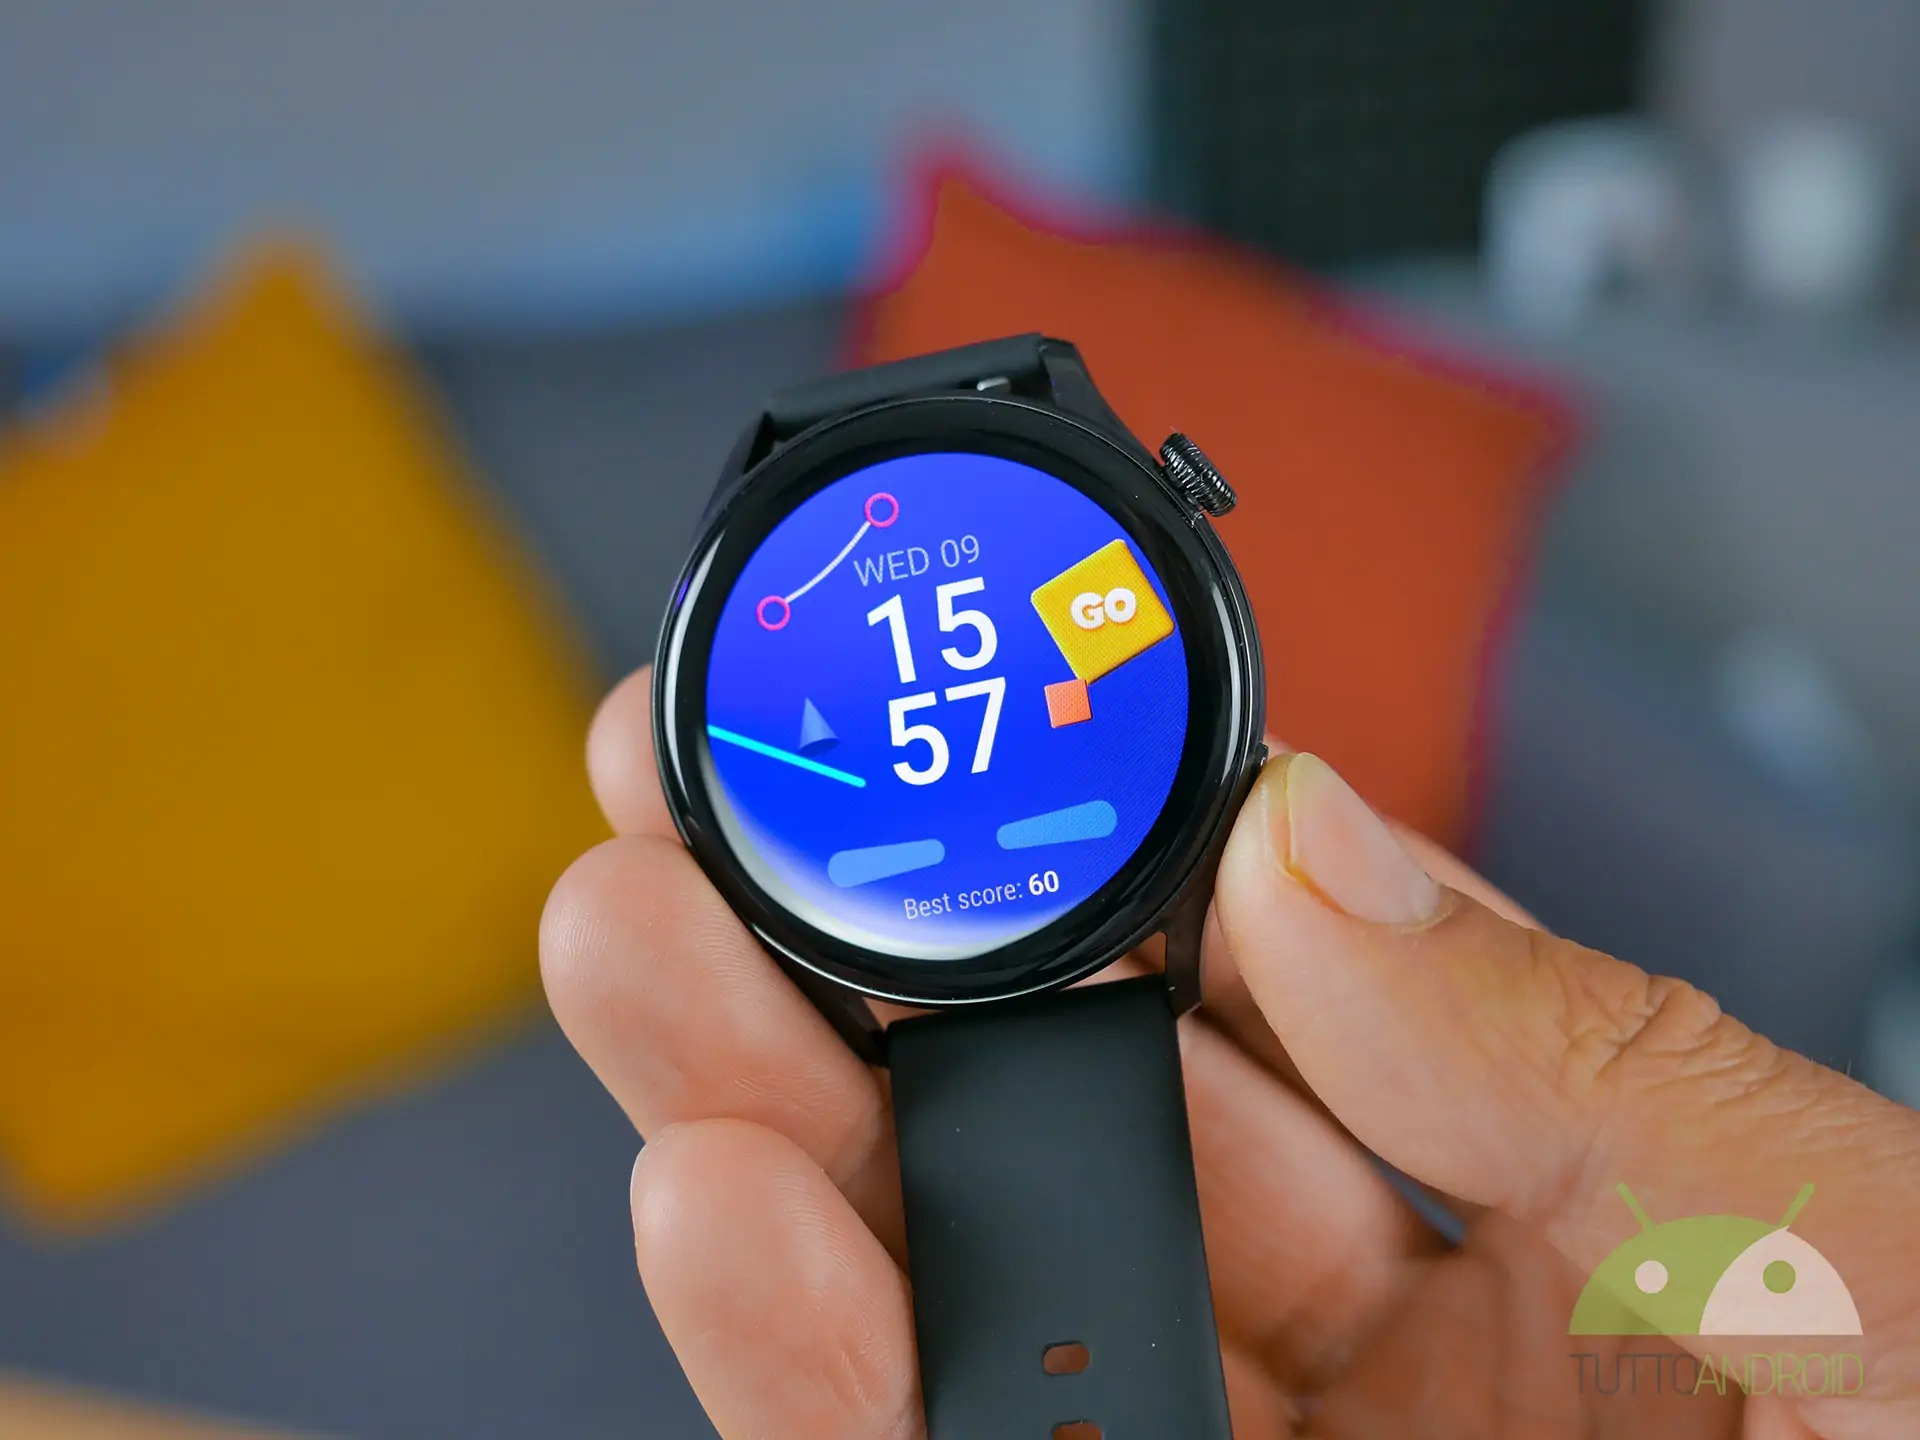 Non lasciatevi scappare queste offerte su Huawei Watch 3